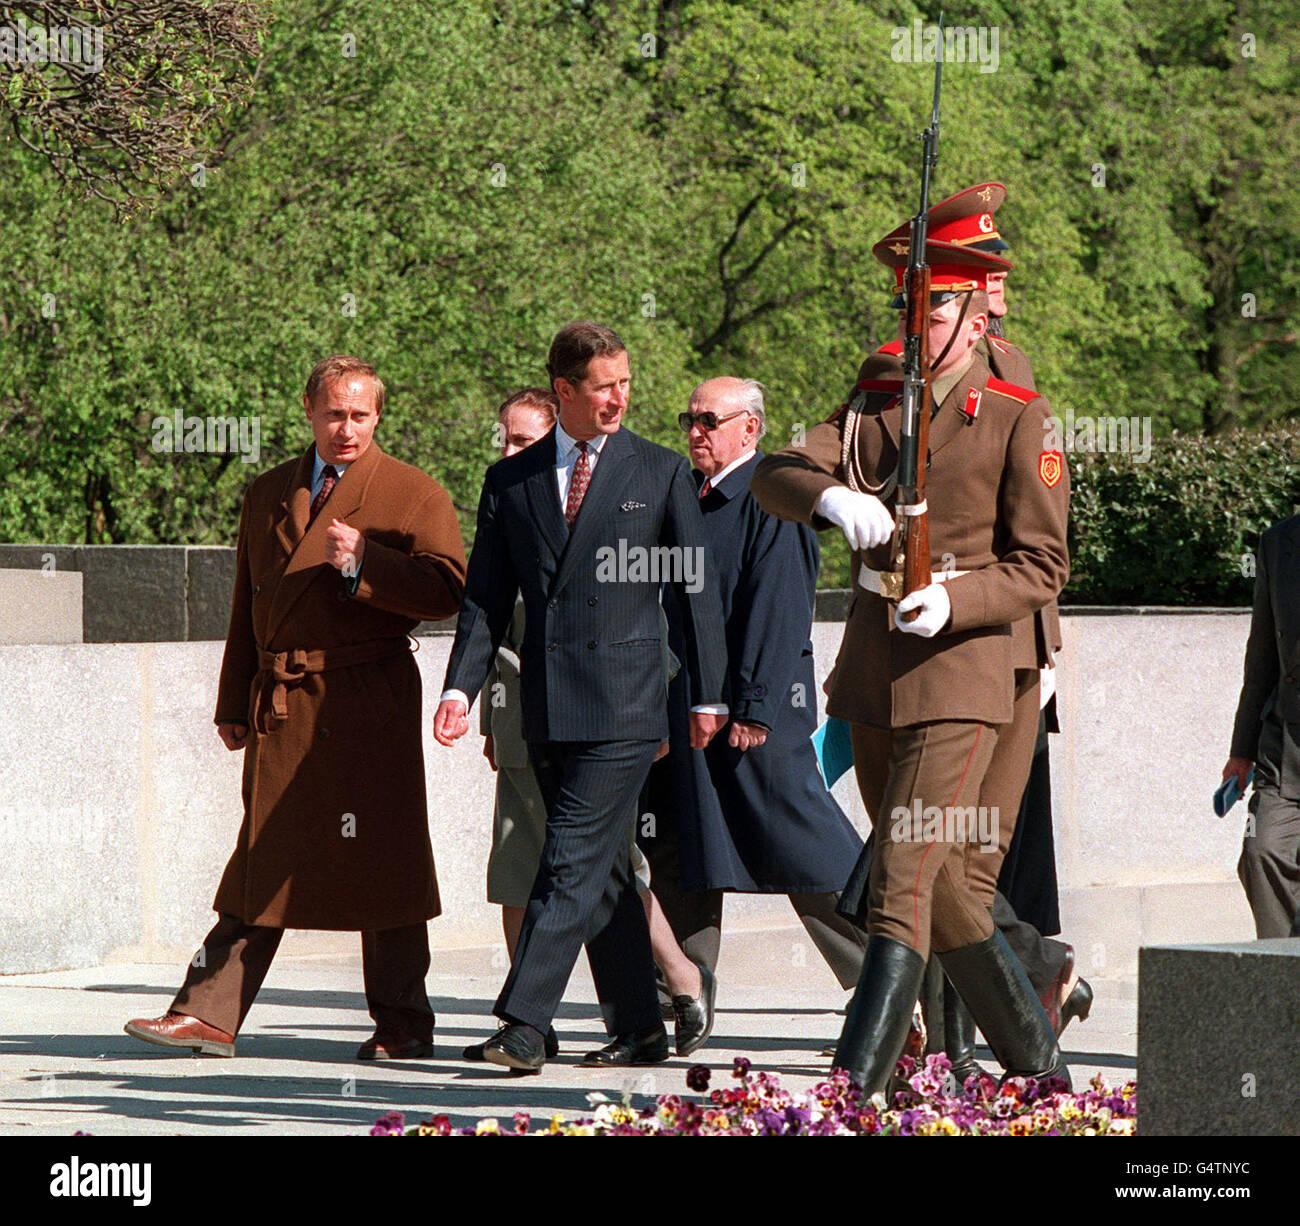 Prince Charles & Vladimir Putin - Stock Image